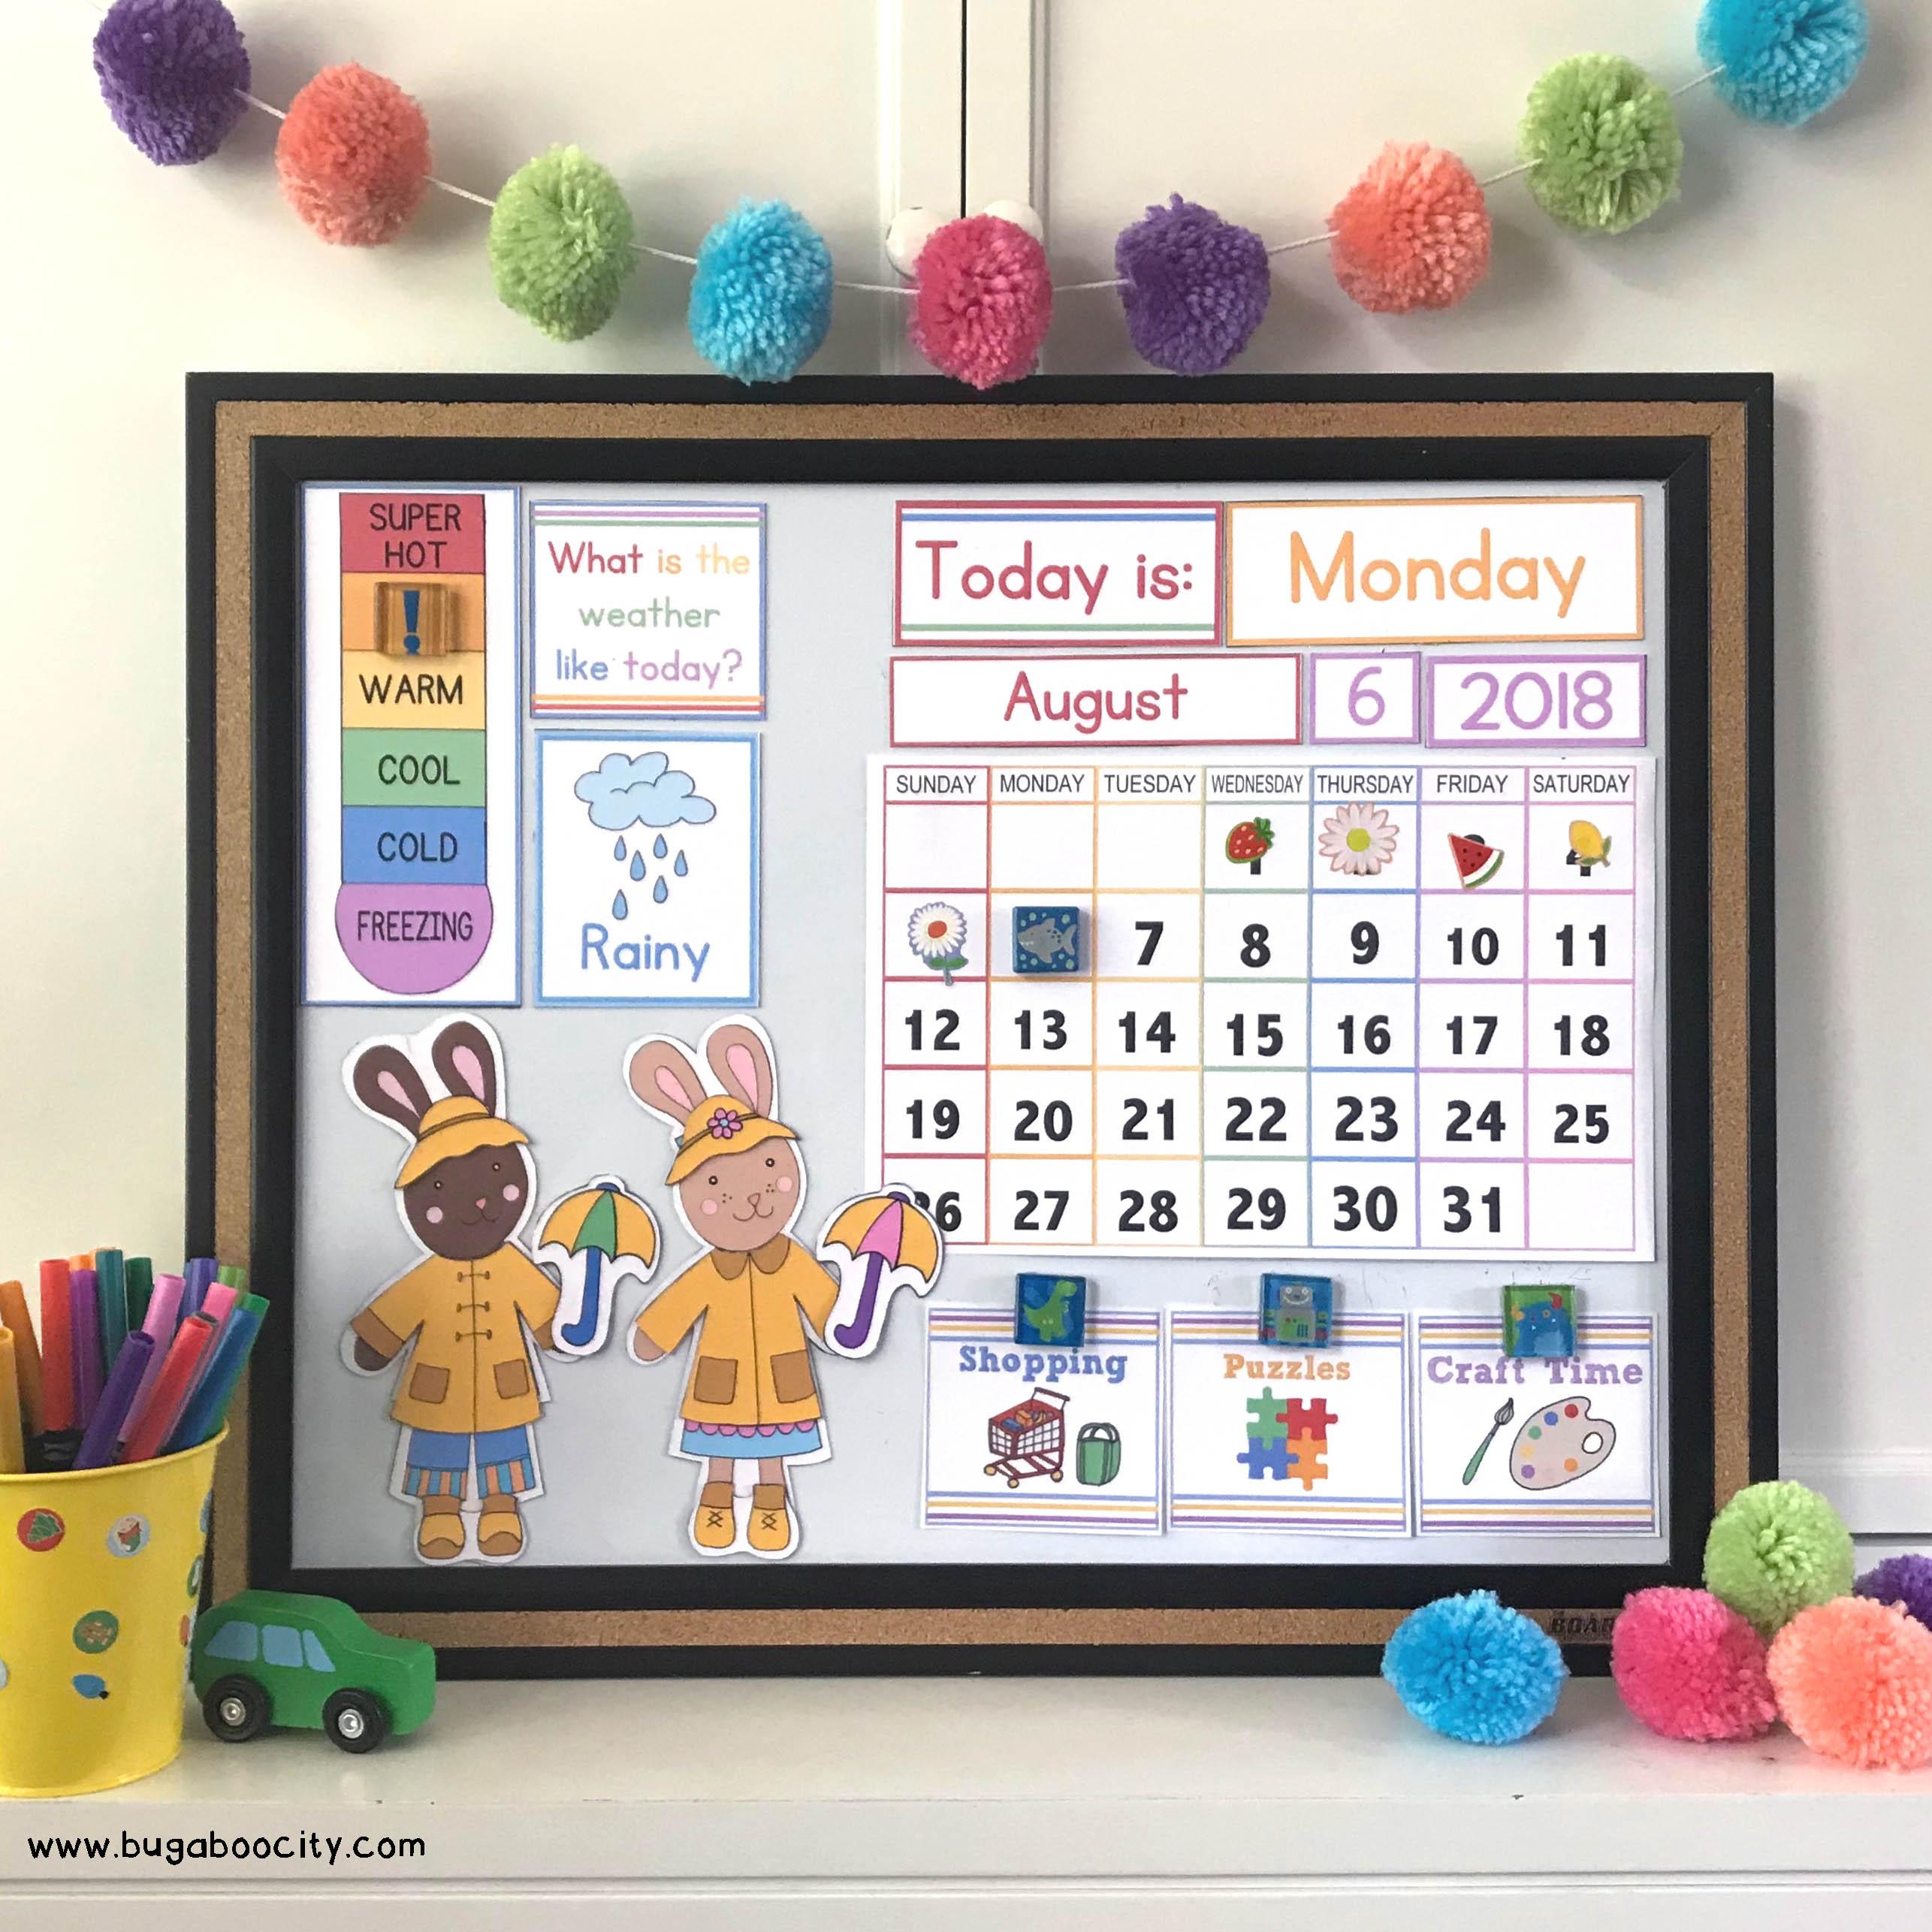 Diy Calendar Printables : Diy children s calendar with free printables bugaboocity